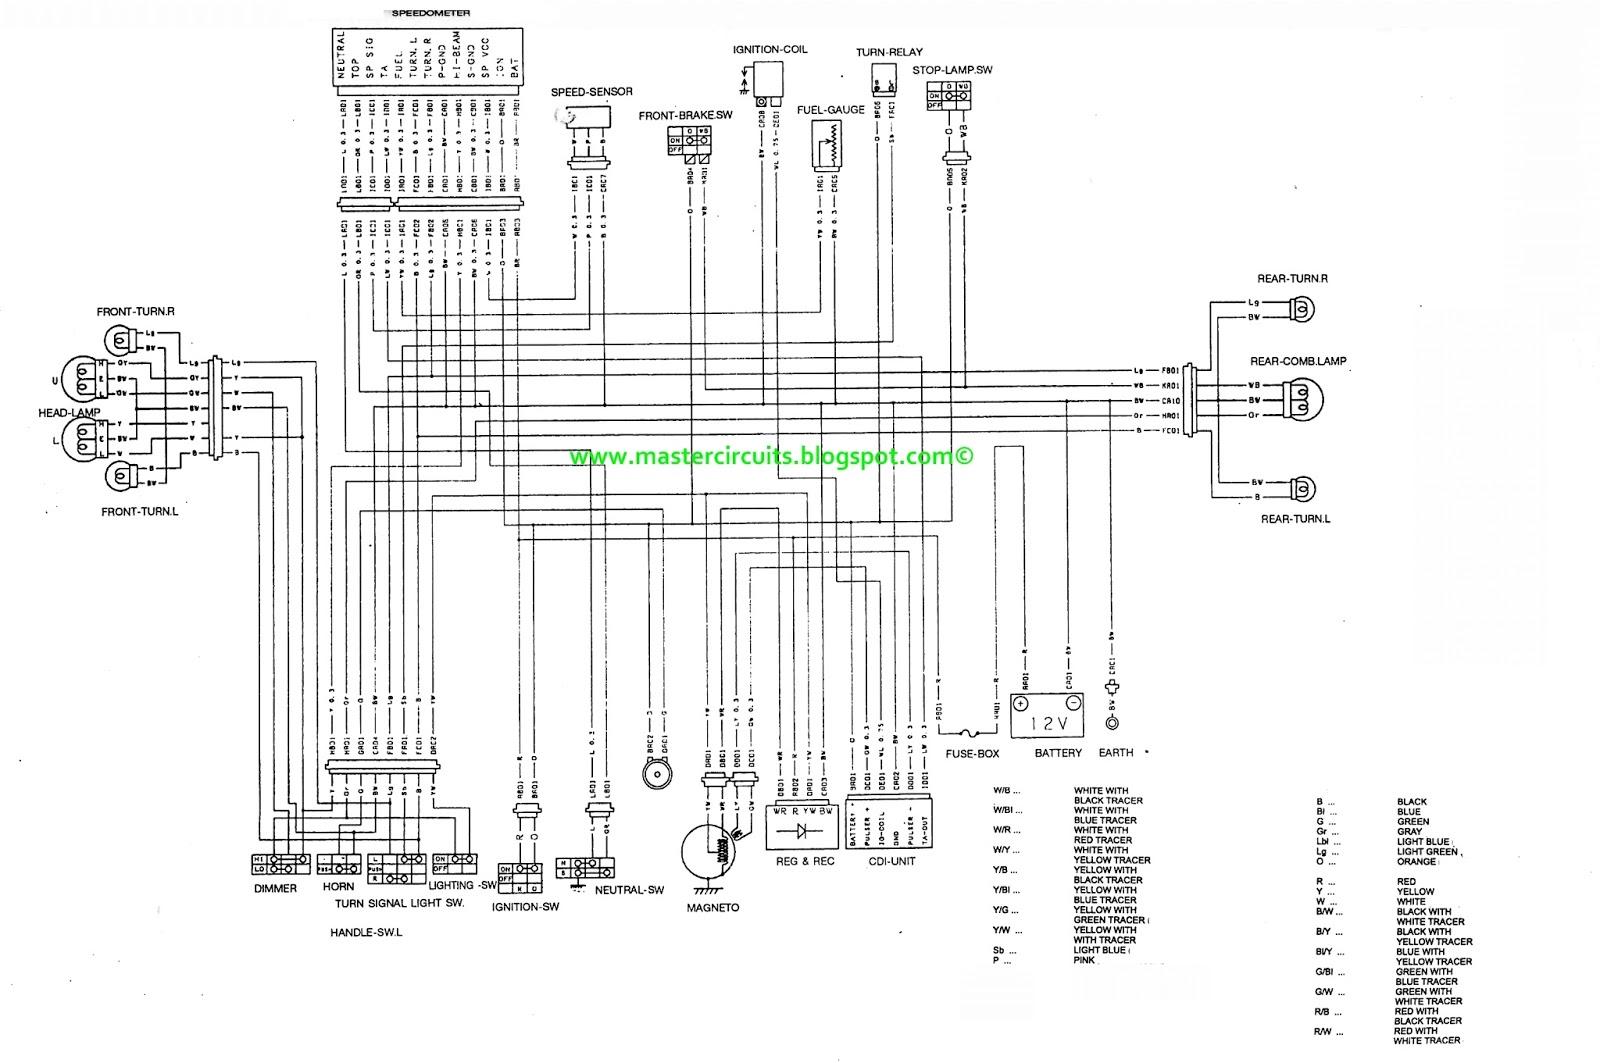 2012 Suzuki Sx4 Wiring Diagram Detailed Diagrams 2013 Elantra And Colors Schematic Wire Kia Sportage